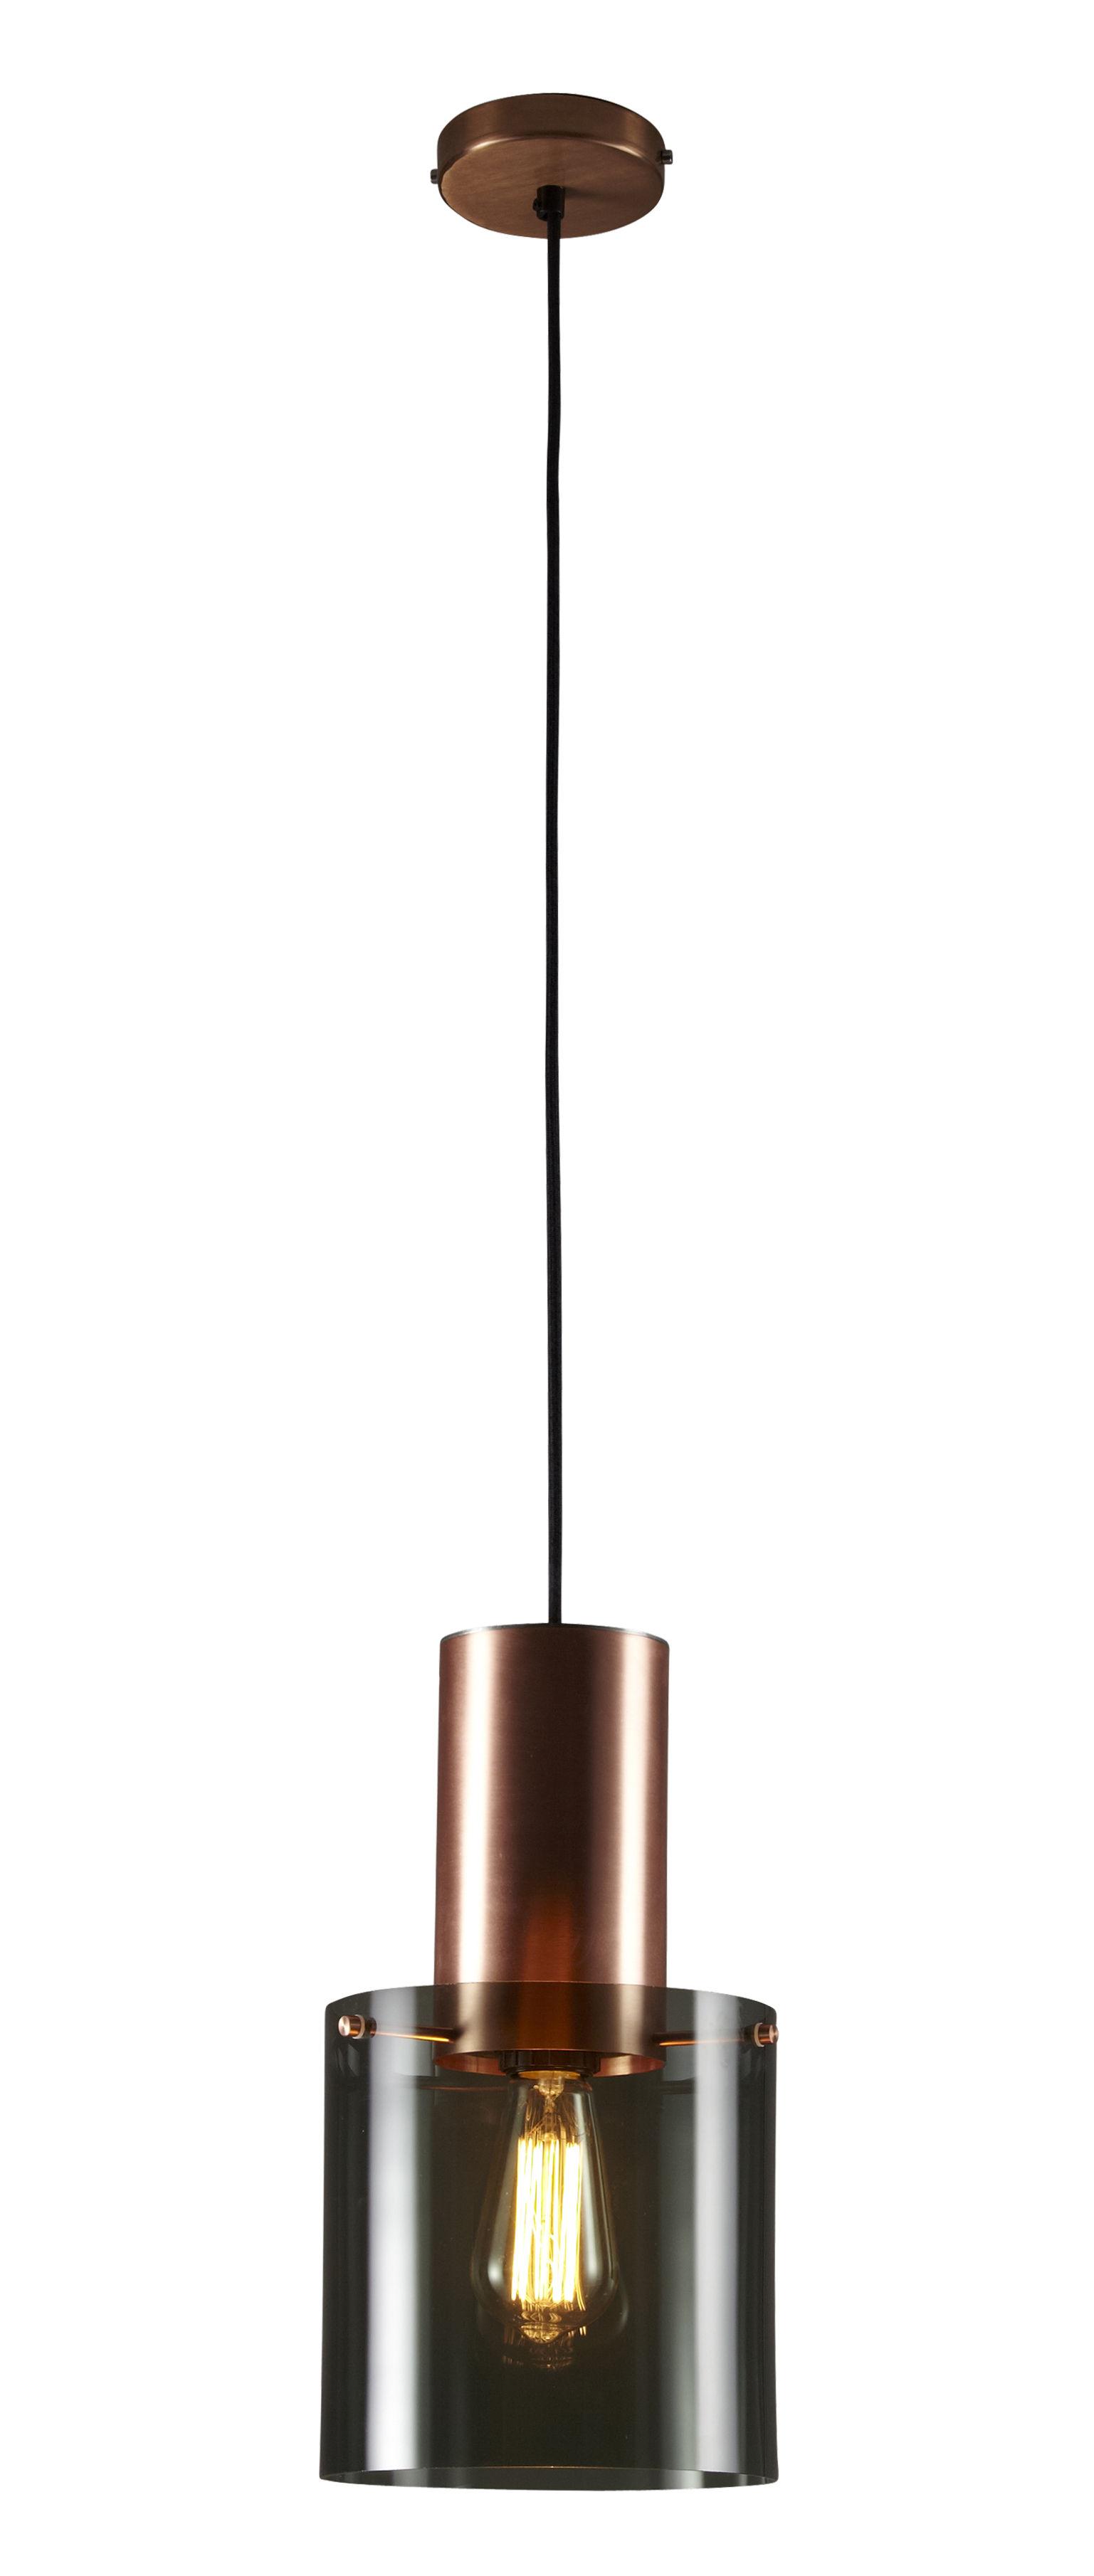 Lighting - Pendant Lighting - Walter 2 Pendant - H 36 cm by Original BTC - Anthracite glass & Copper - Glass, Satined copper